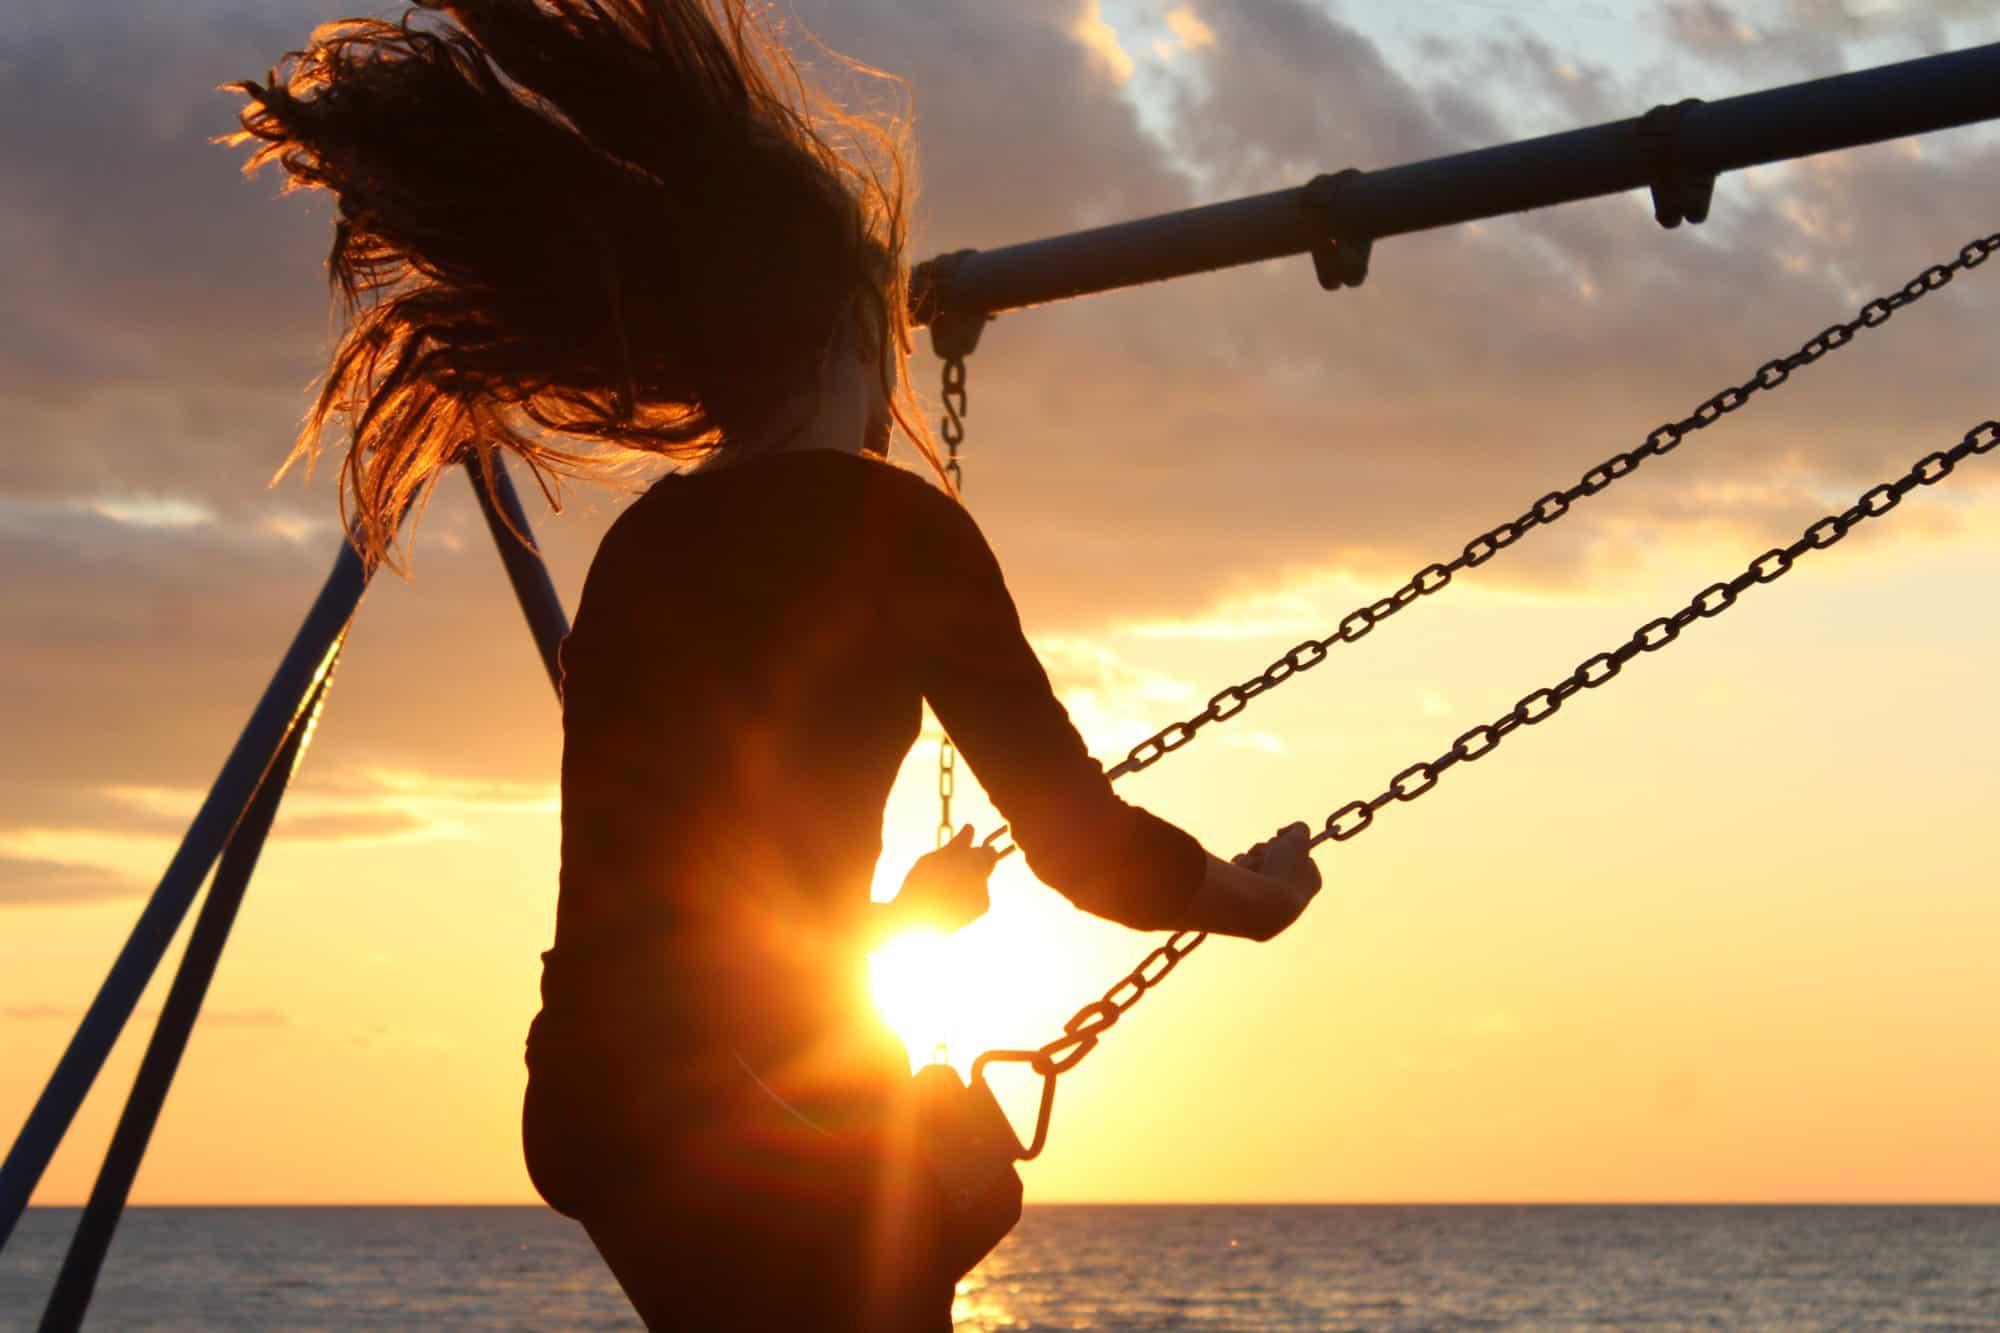 Joyful Balance Wellness - woman on a swing